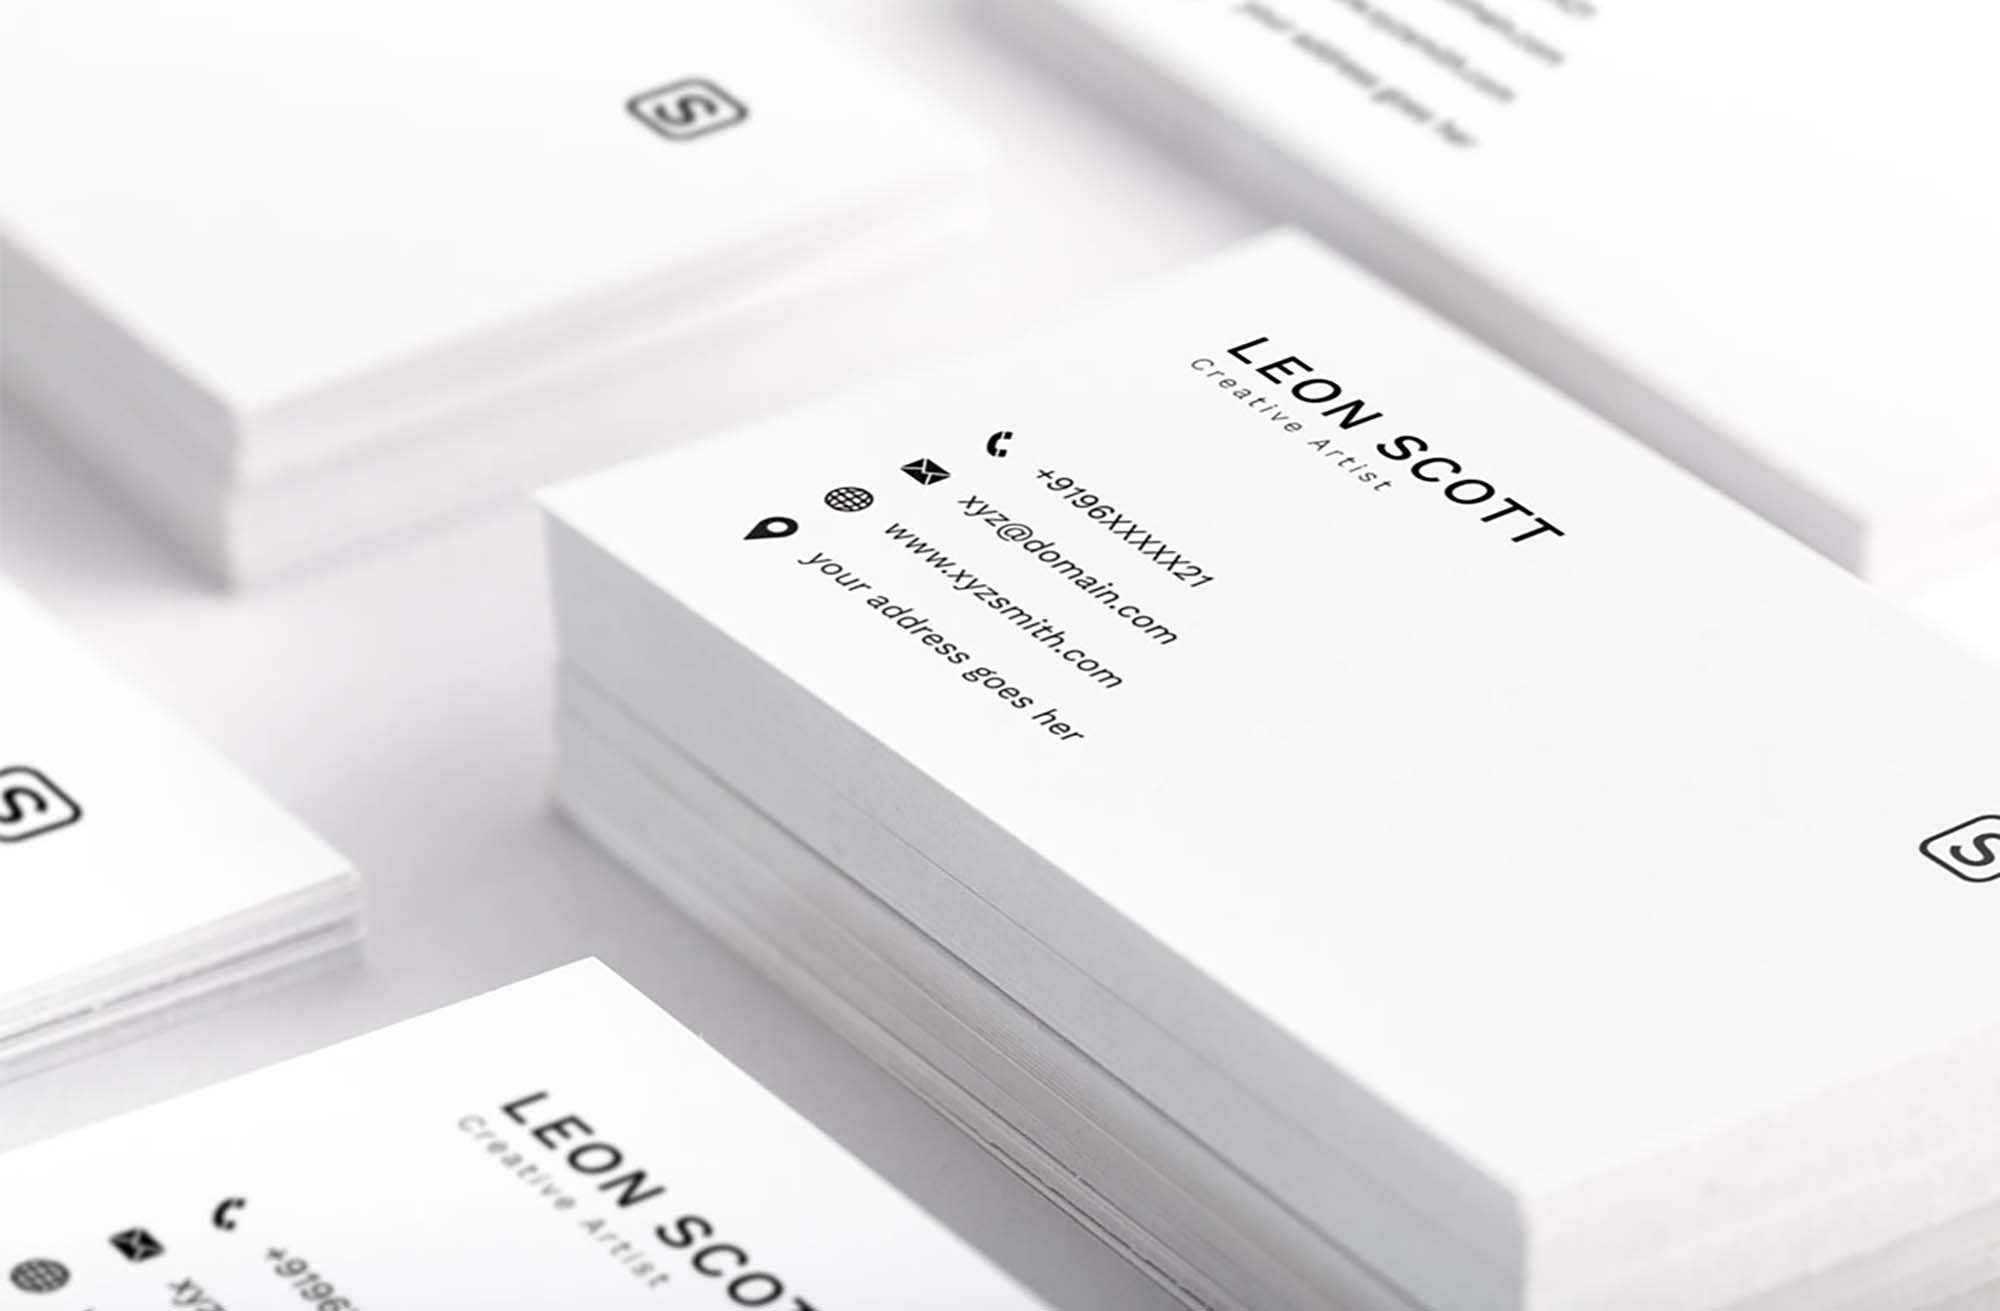 Free Minimal Elegant Business Card Template (Psd) Throughout Free Business Card Templates In Psd Format